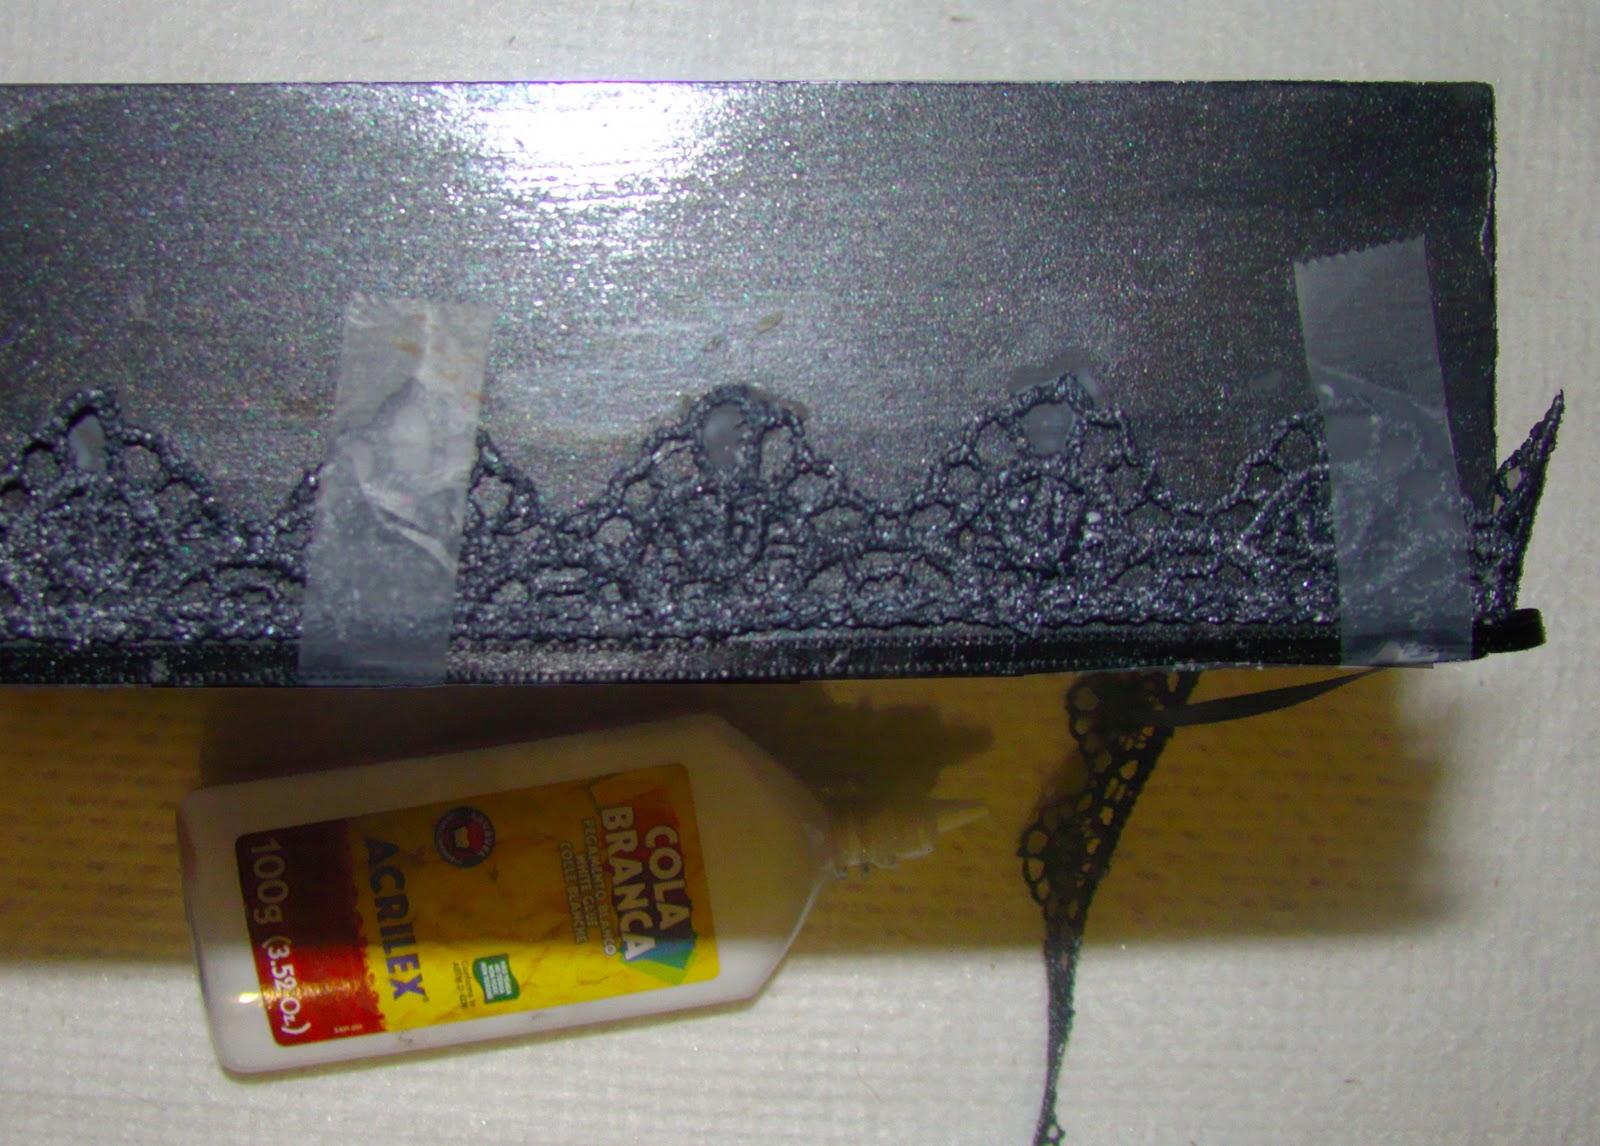 Caixa preta e branca: renda fita e biju EntreArtes #B79C08 1600x1146